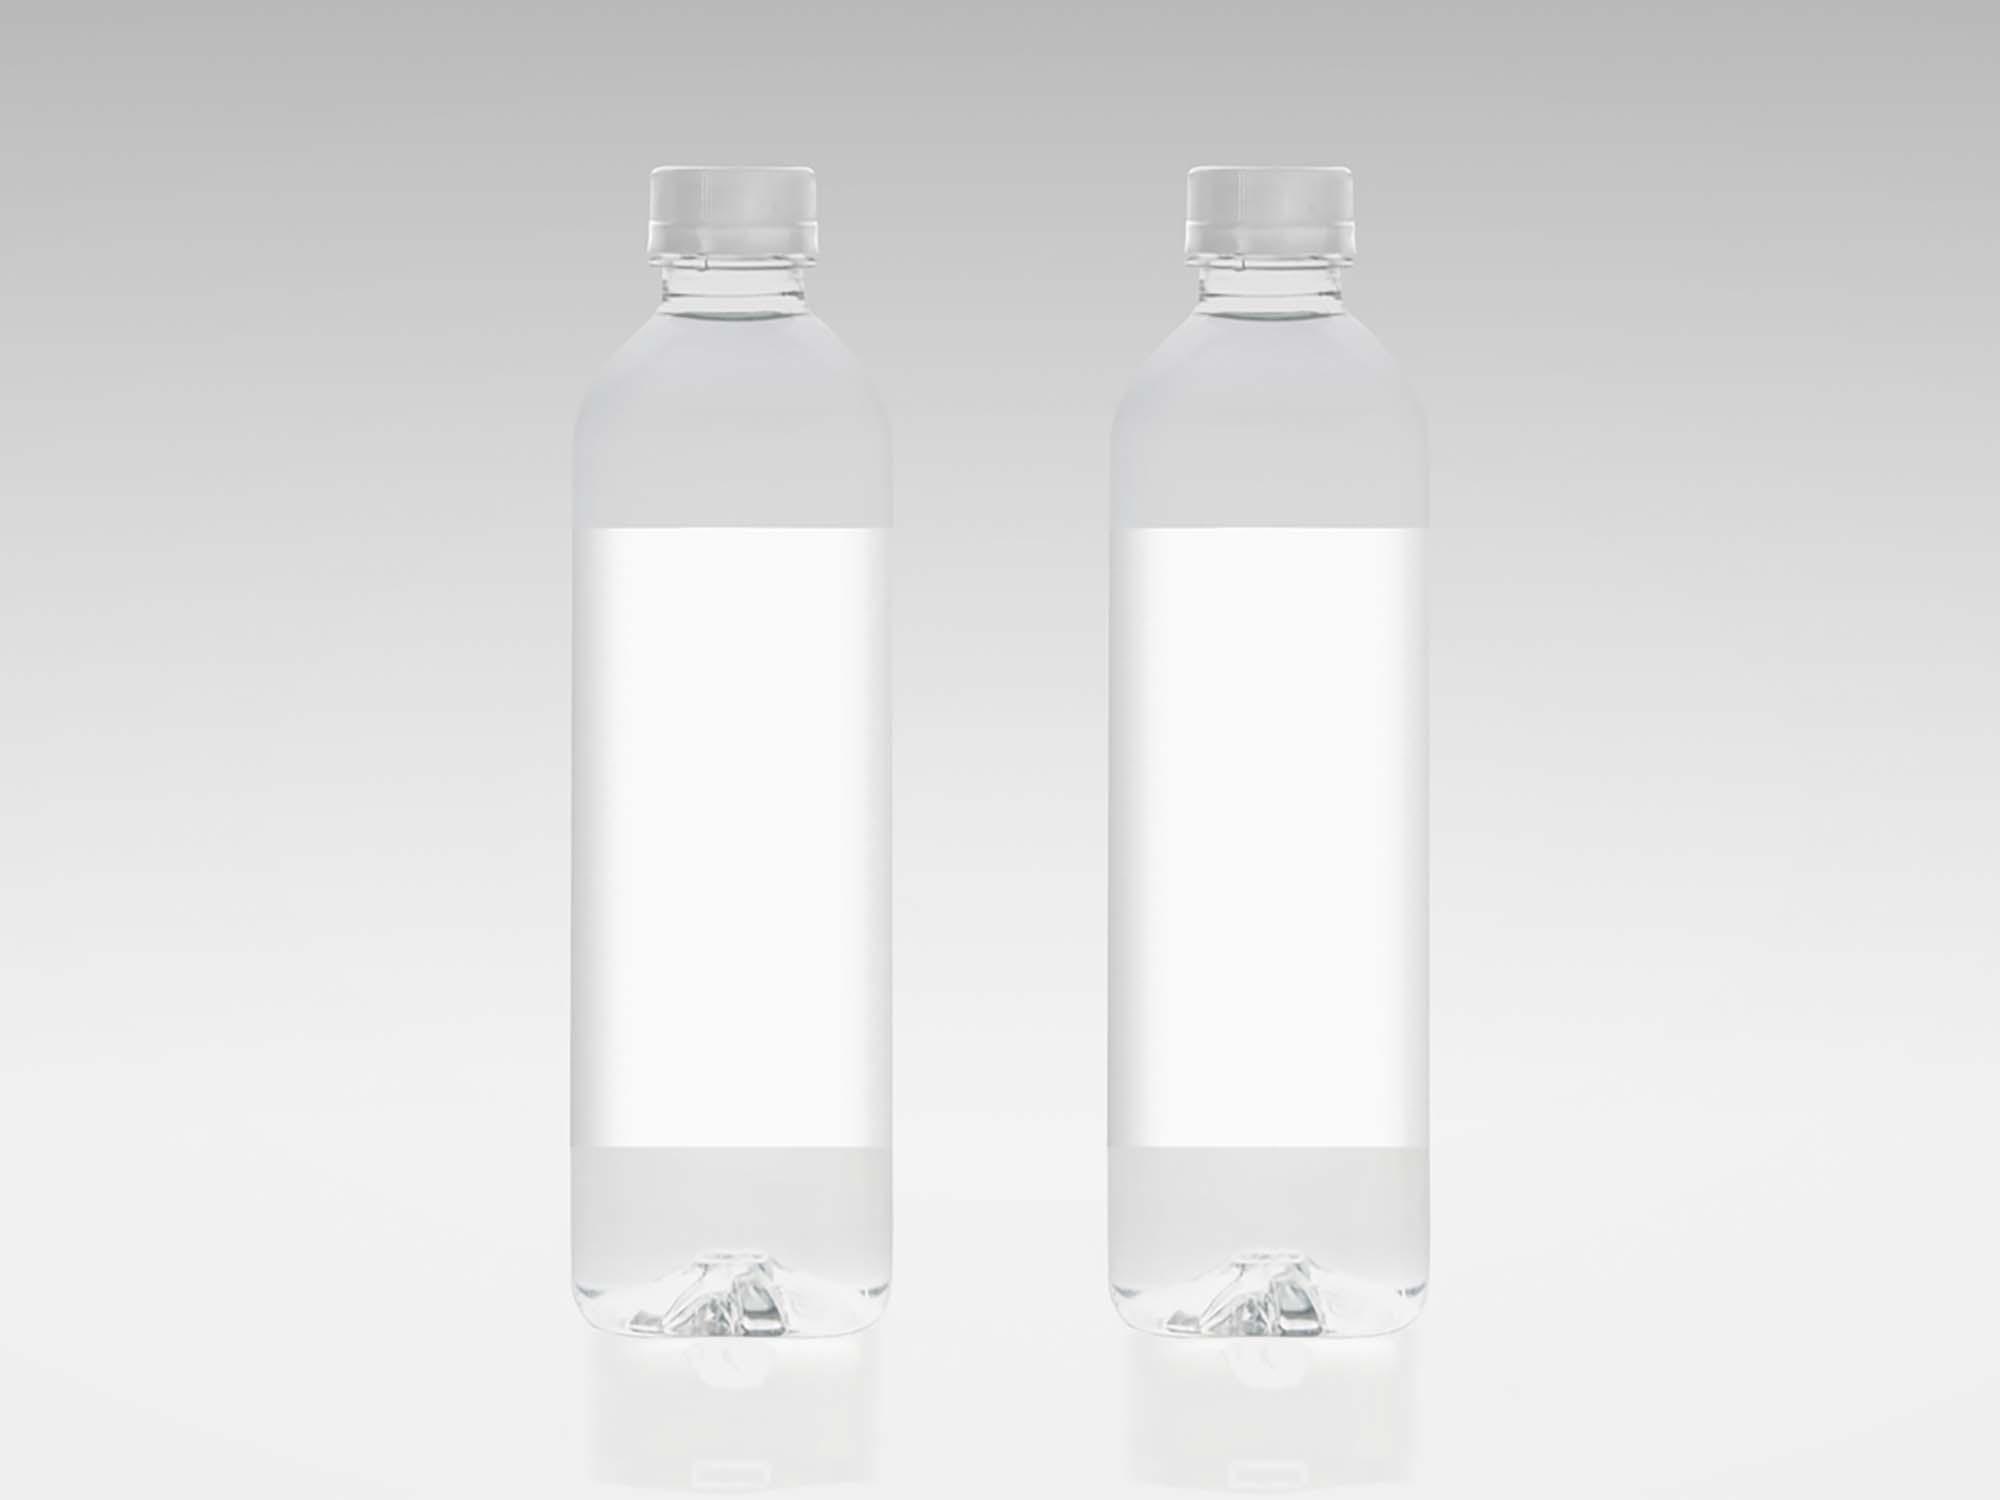 Water Bottles Mockup 2